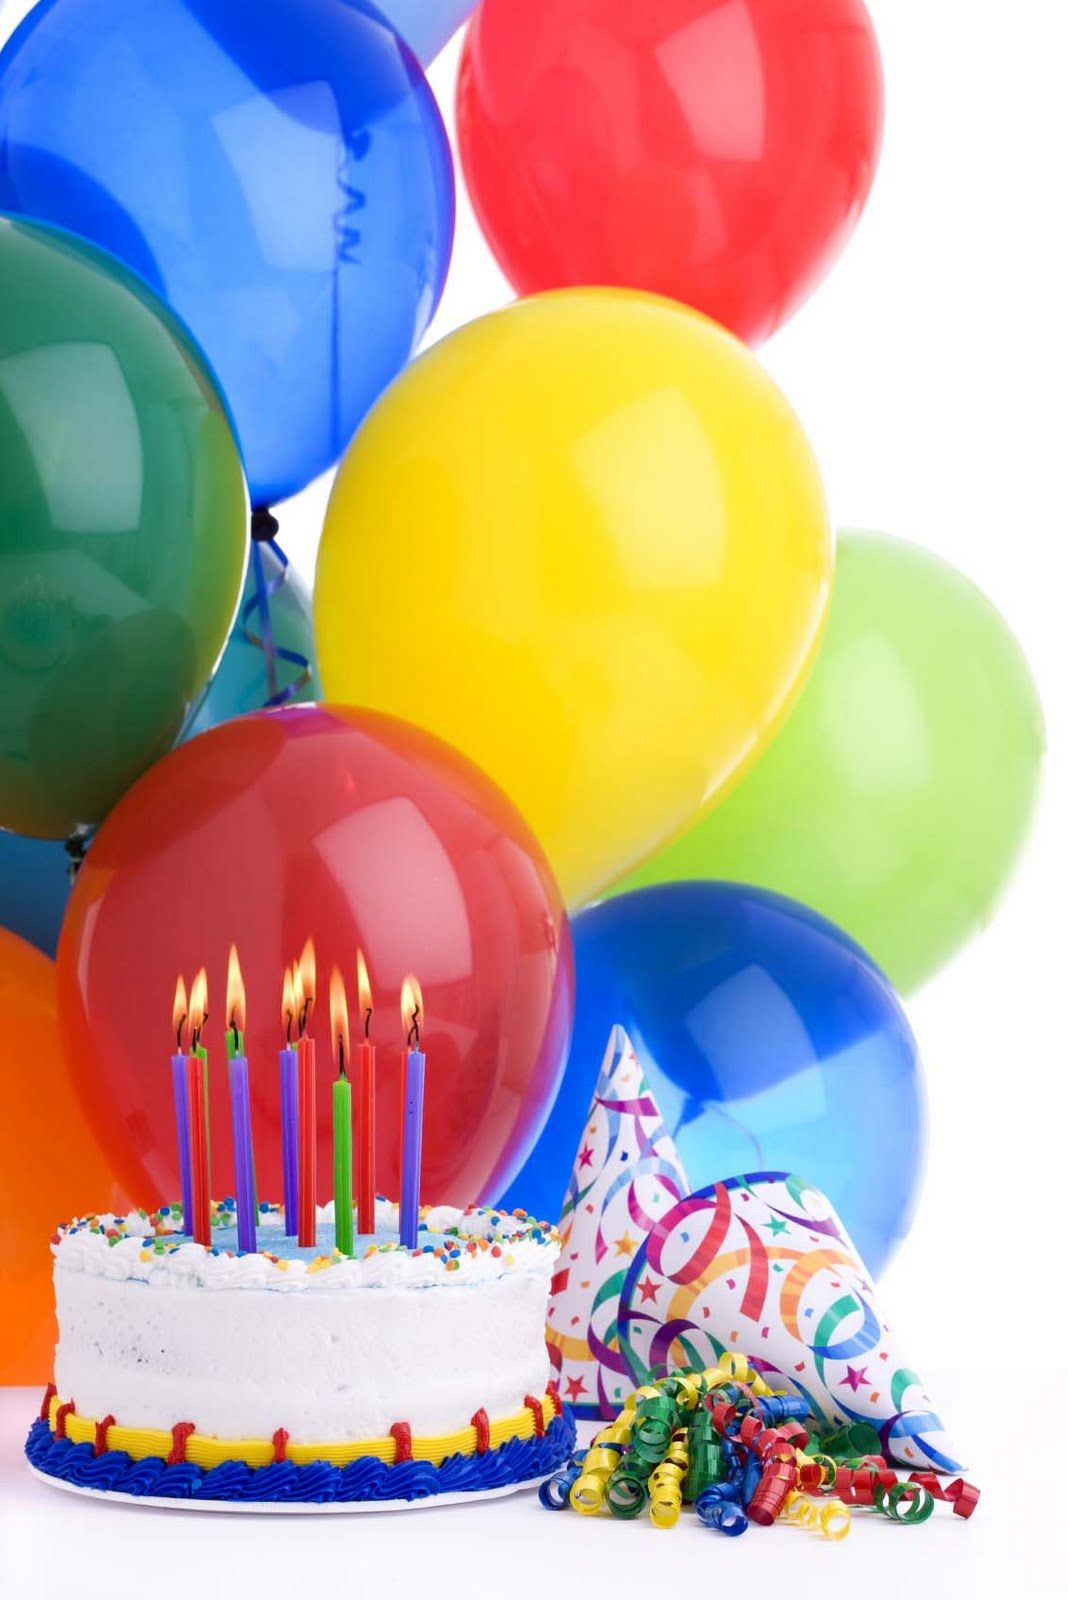 Birthday cake and balloons BALLOONS Pinterest Birthday